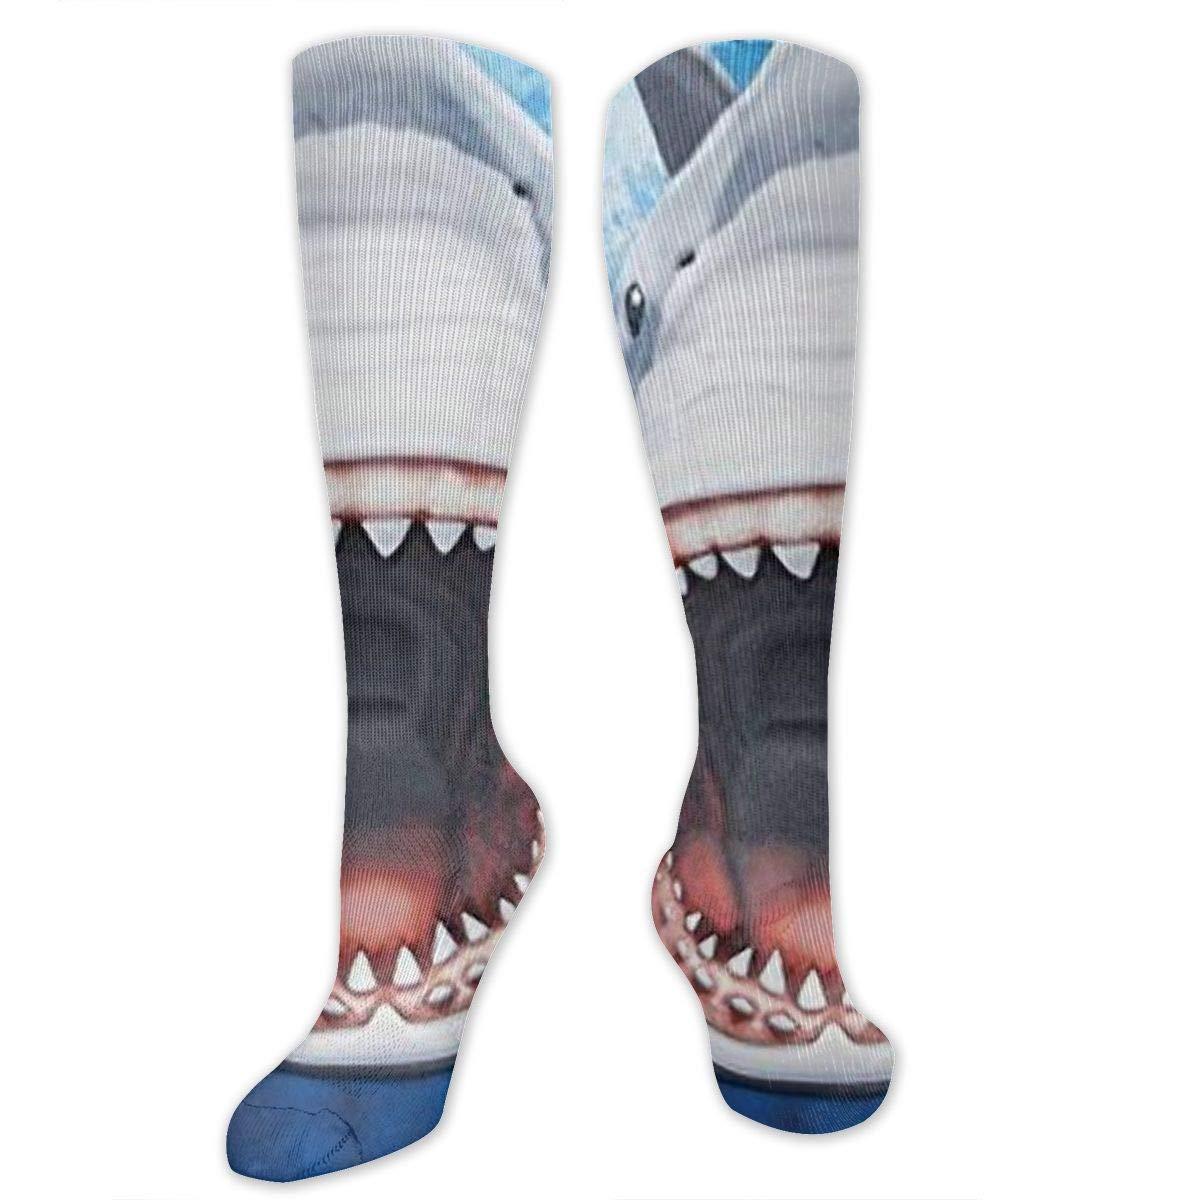 Socks Shark Mens//Womens Sensitive Feet Wide Fit Crew Socks and Cotton Crew Athletic Sock